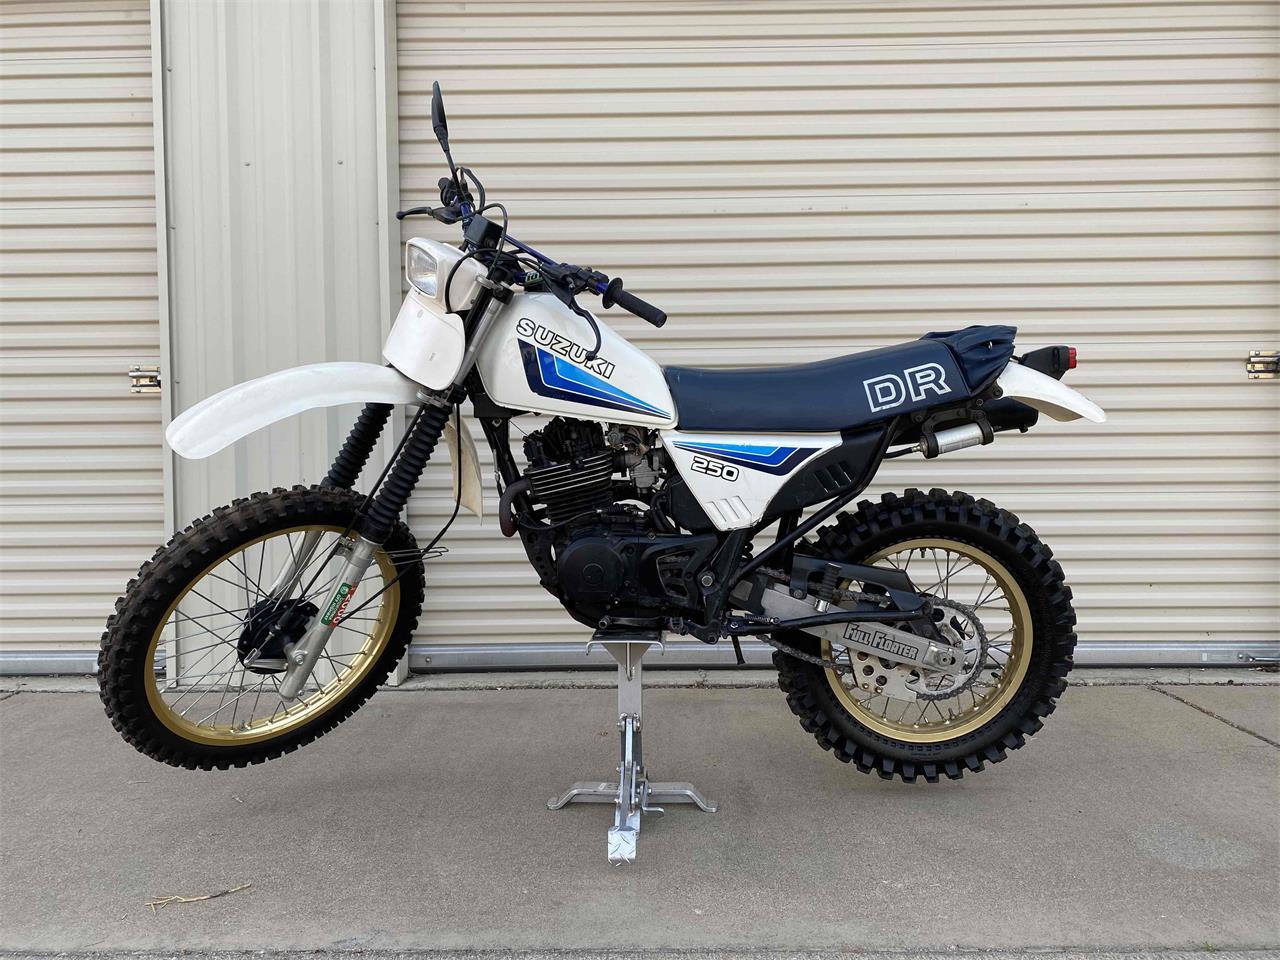 1983 Suzuki Motorcycle (CC-1367425) for sale in Anderson, California